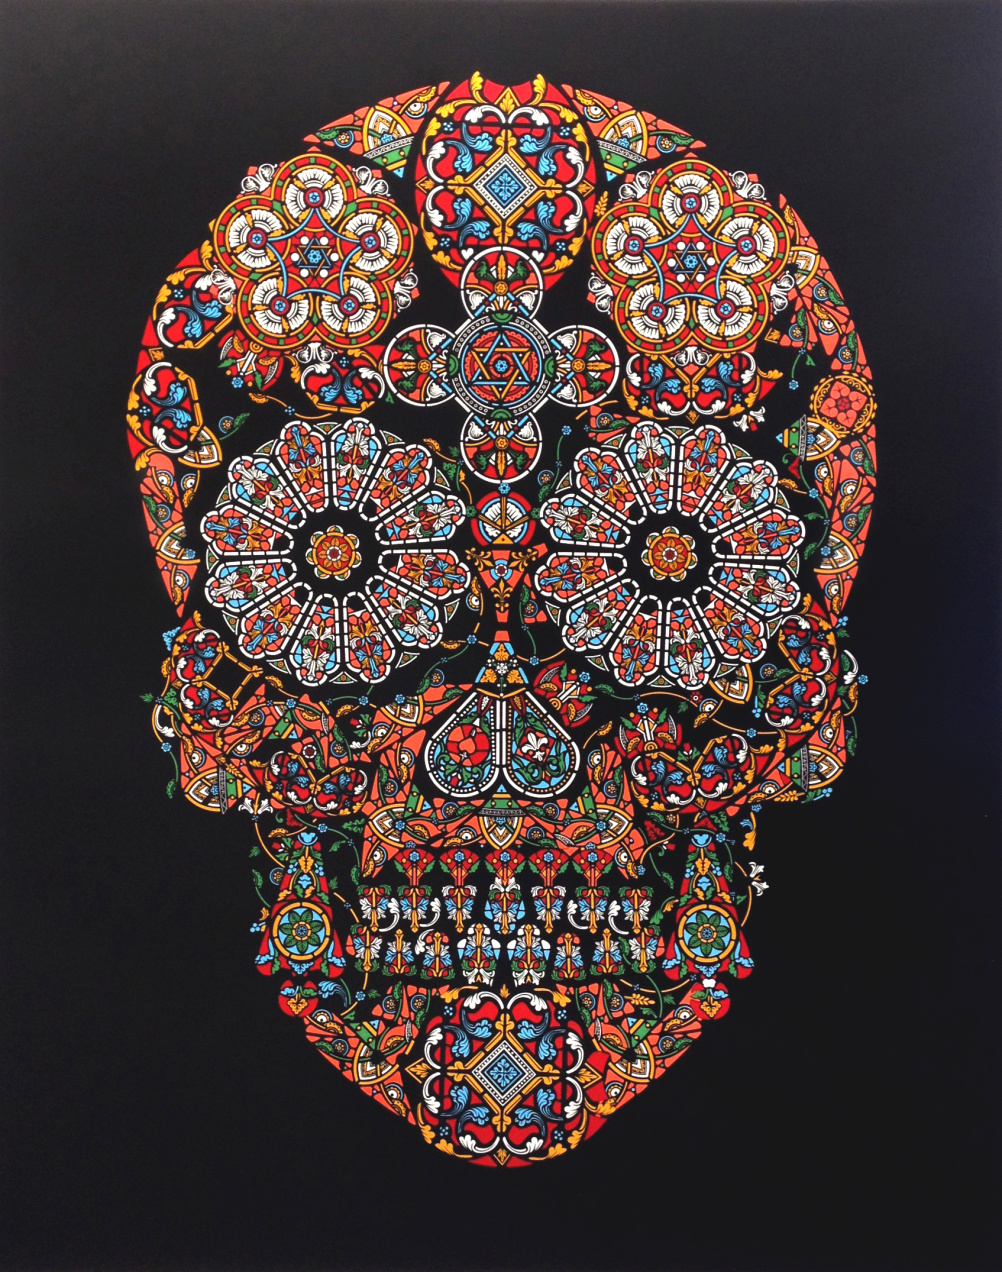 Jacky Tsai Stained Glass Skull 2013